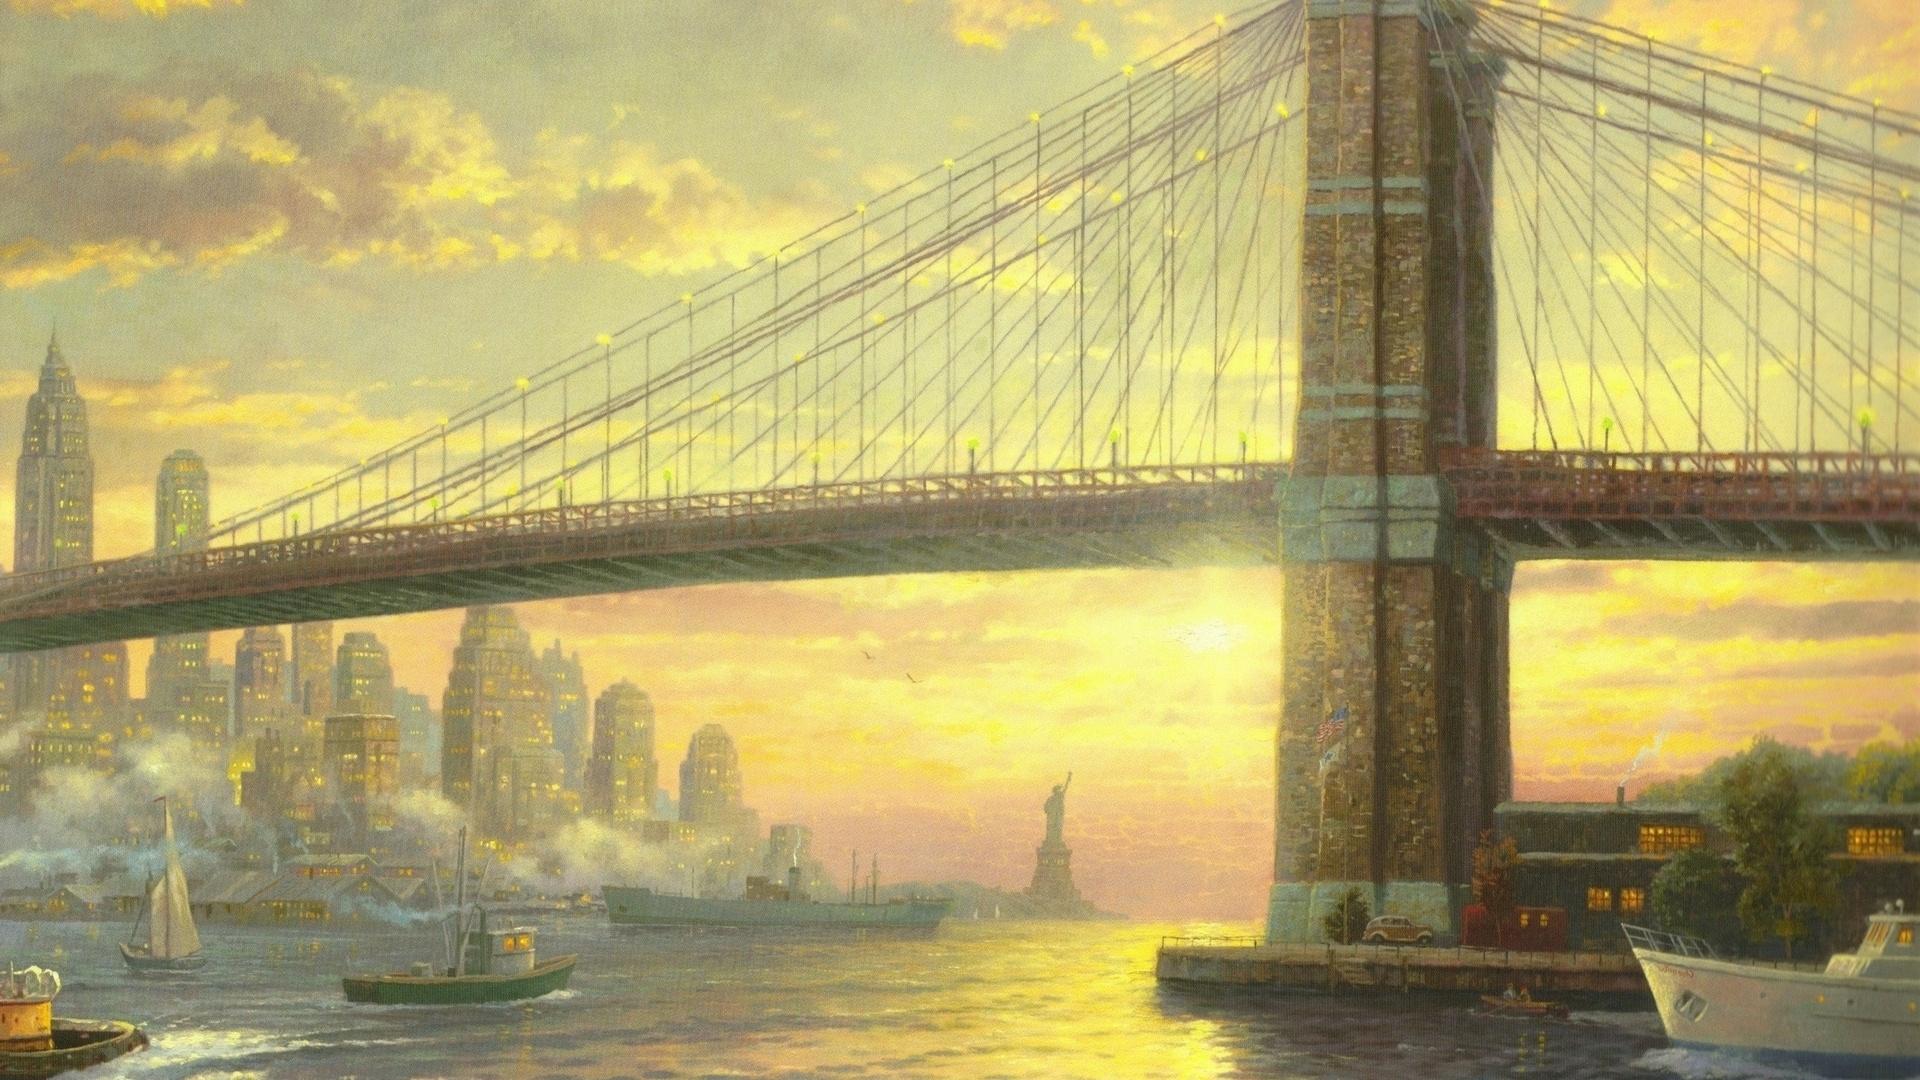 Bridge Art Background